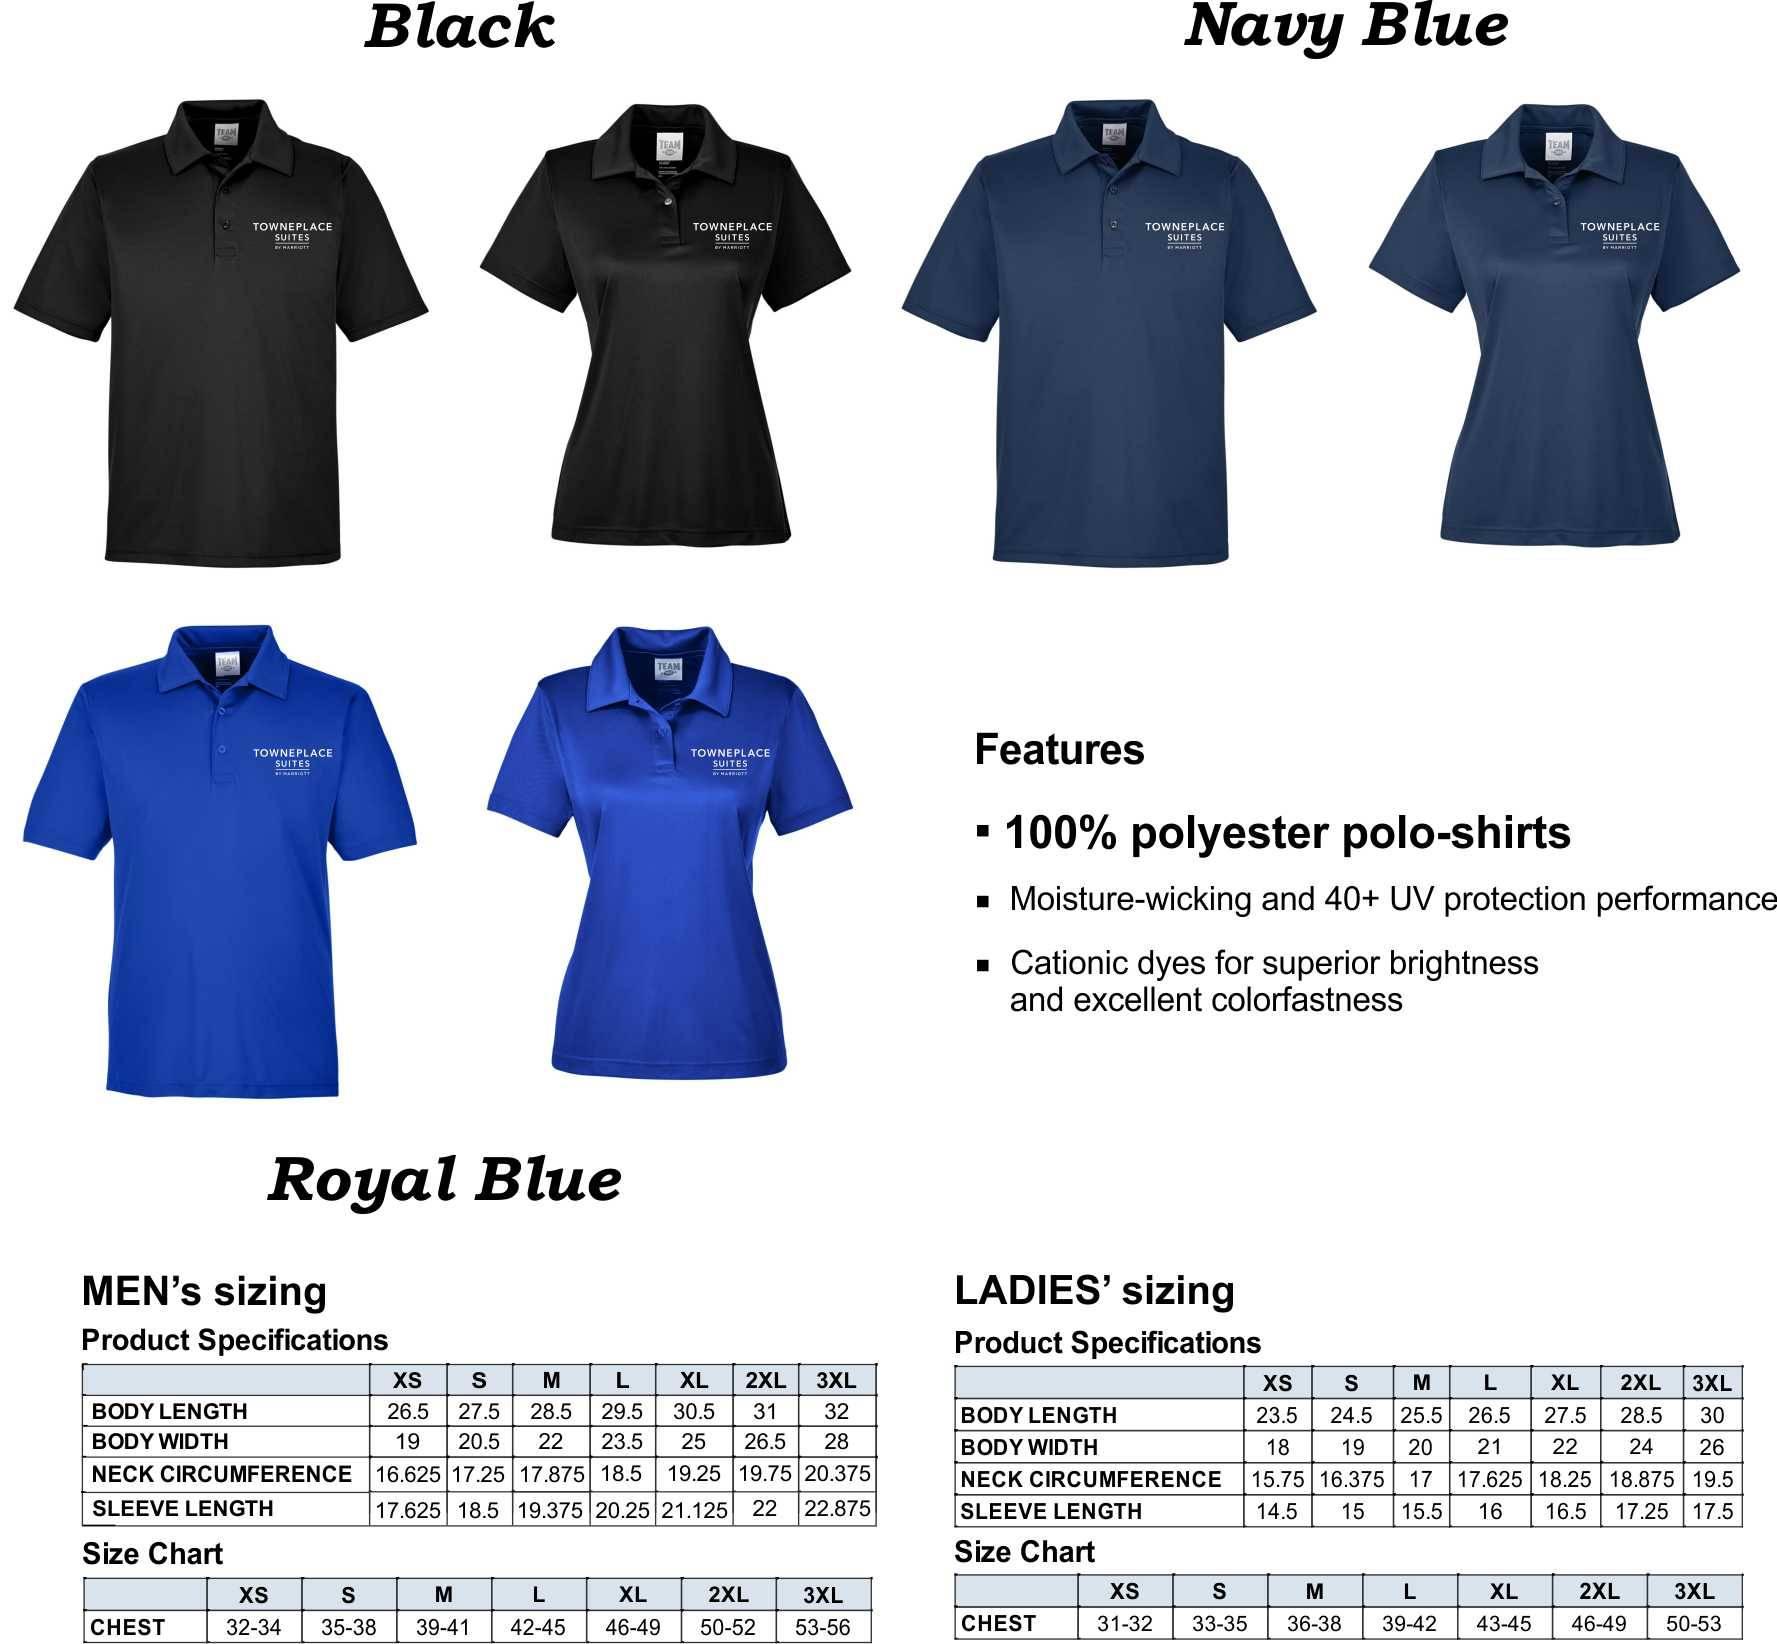 Polo-Shirts, 100% Polyester Dri-Fit | Men's + Ladies' Sizing | Silk-Screen Logo | UV Protection | Moisture-wicking